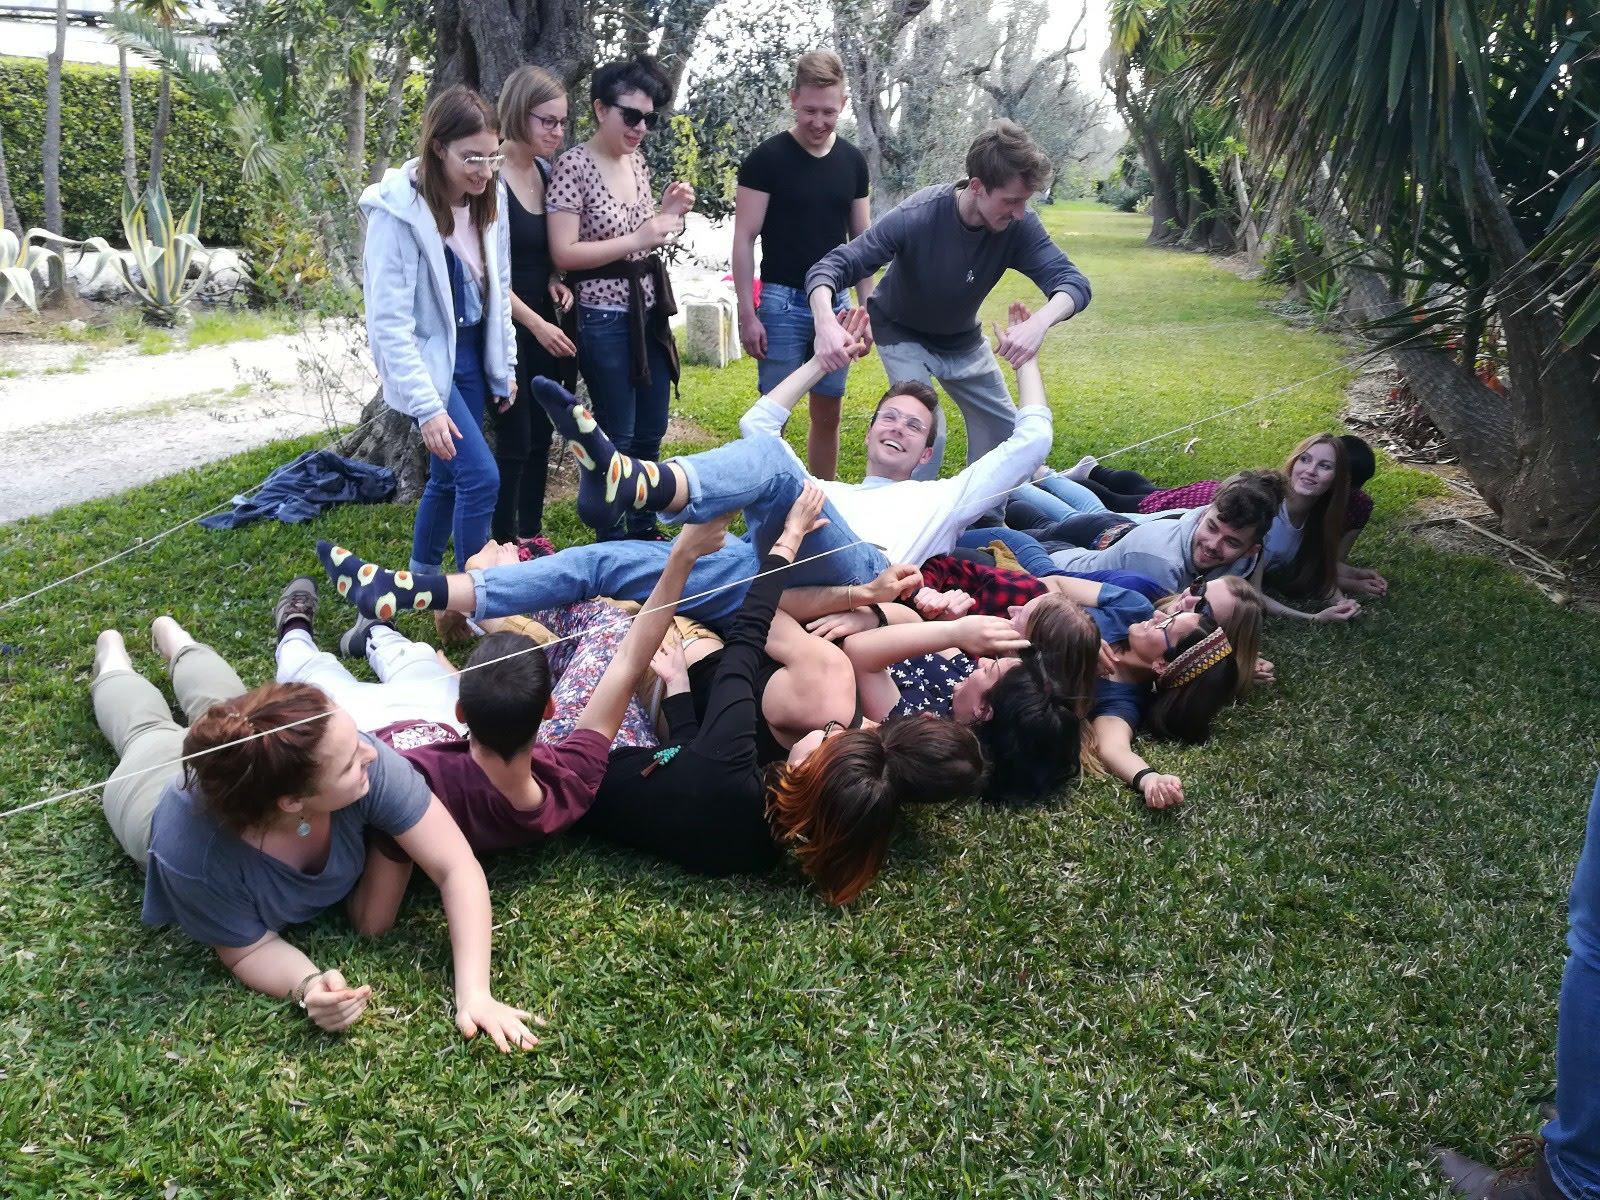 nooretevahetus youth exchange nyh italy itaalia estonia eesti nature